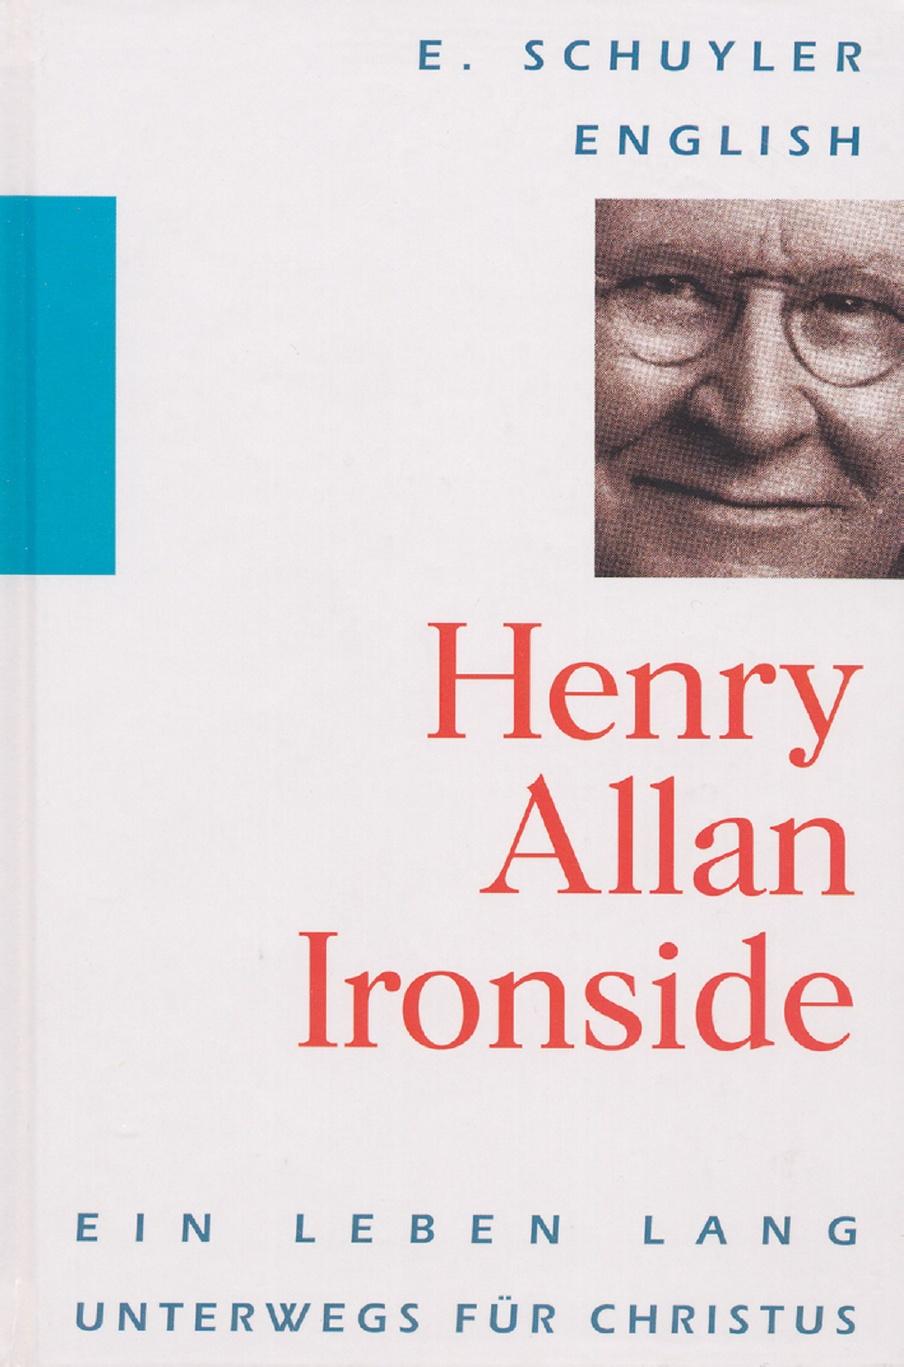 E. Schuyler English-Henry Allan Ironside-